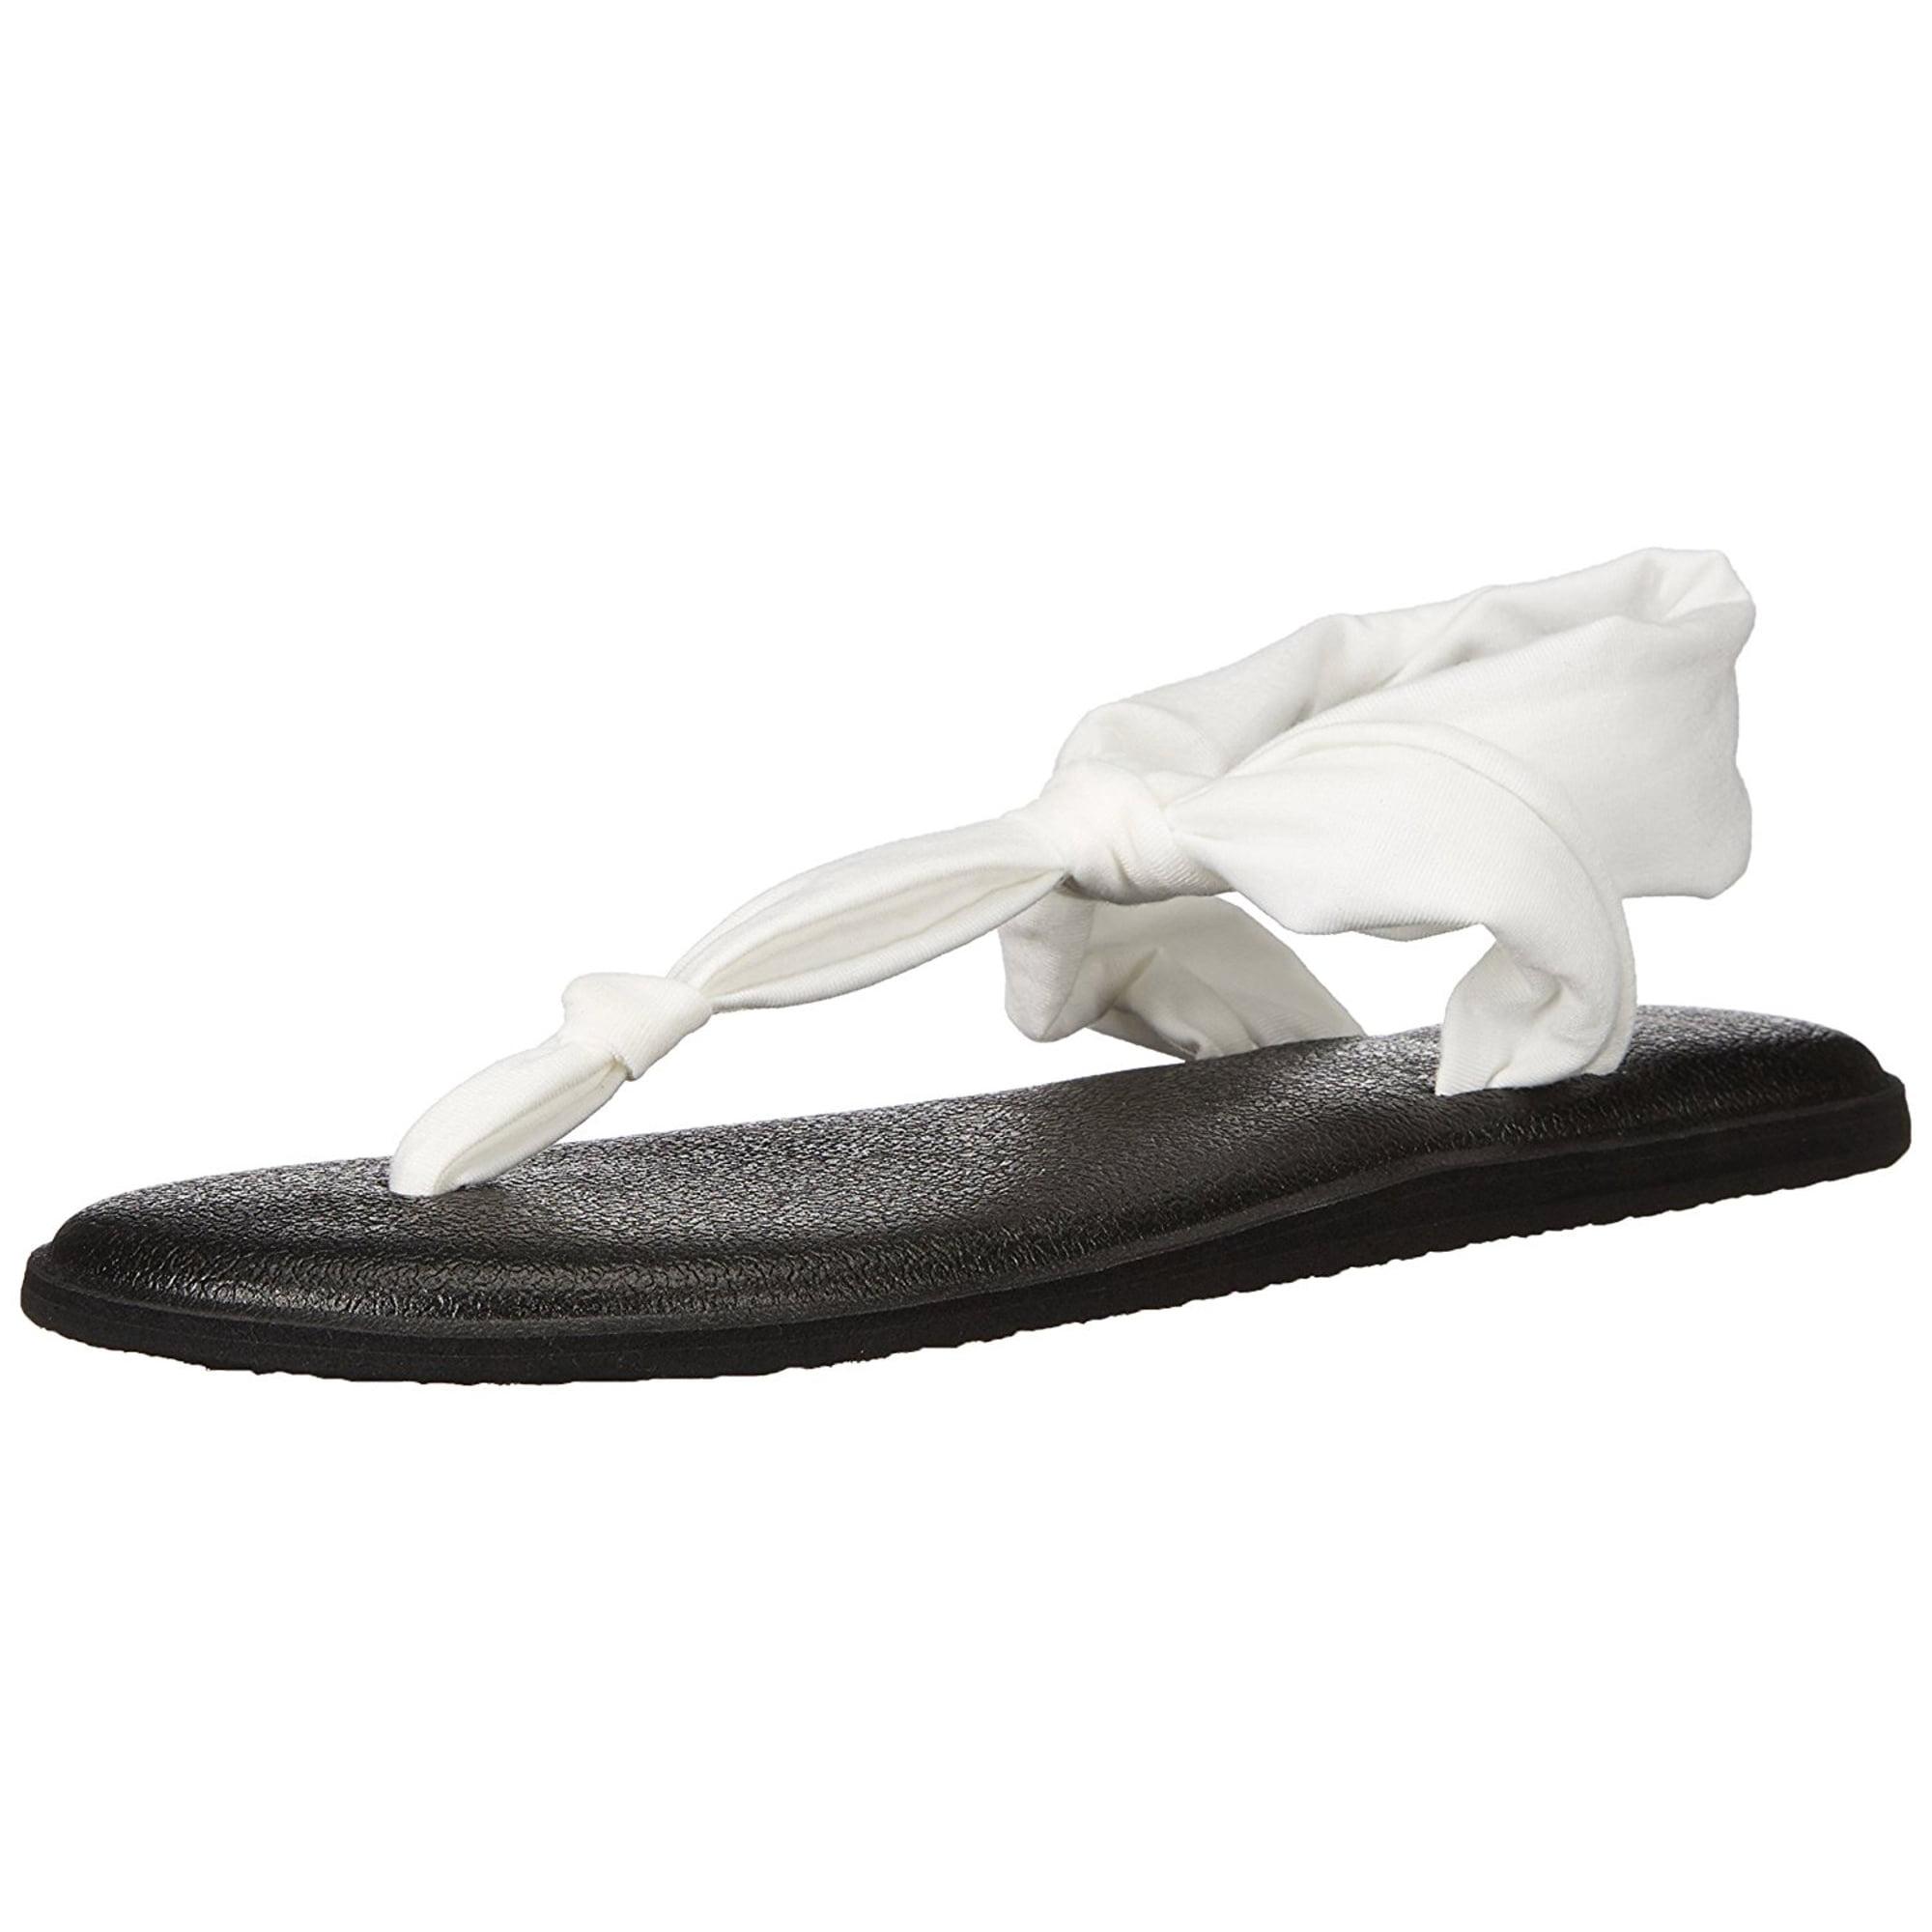 eefee461f0a84a Sanuk Women s Yoga Sling Ella Flip Flop